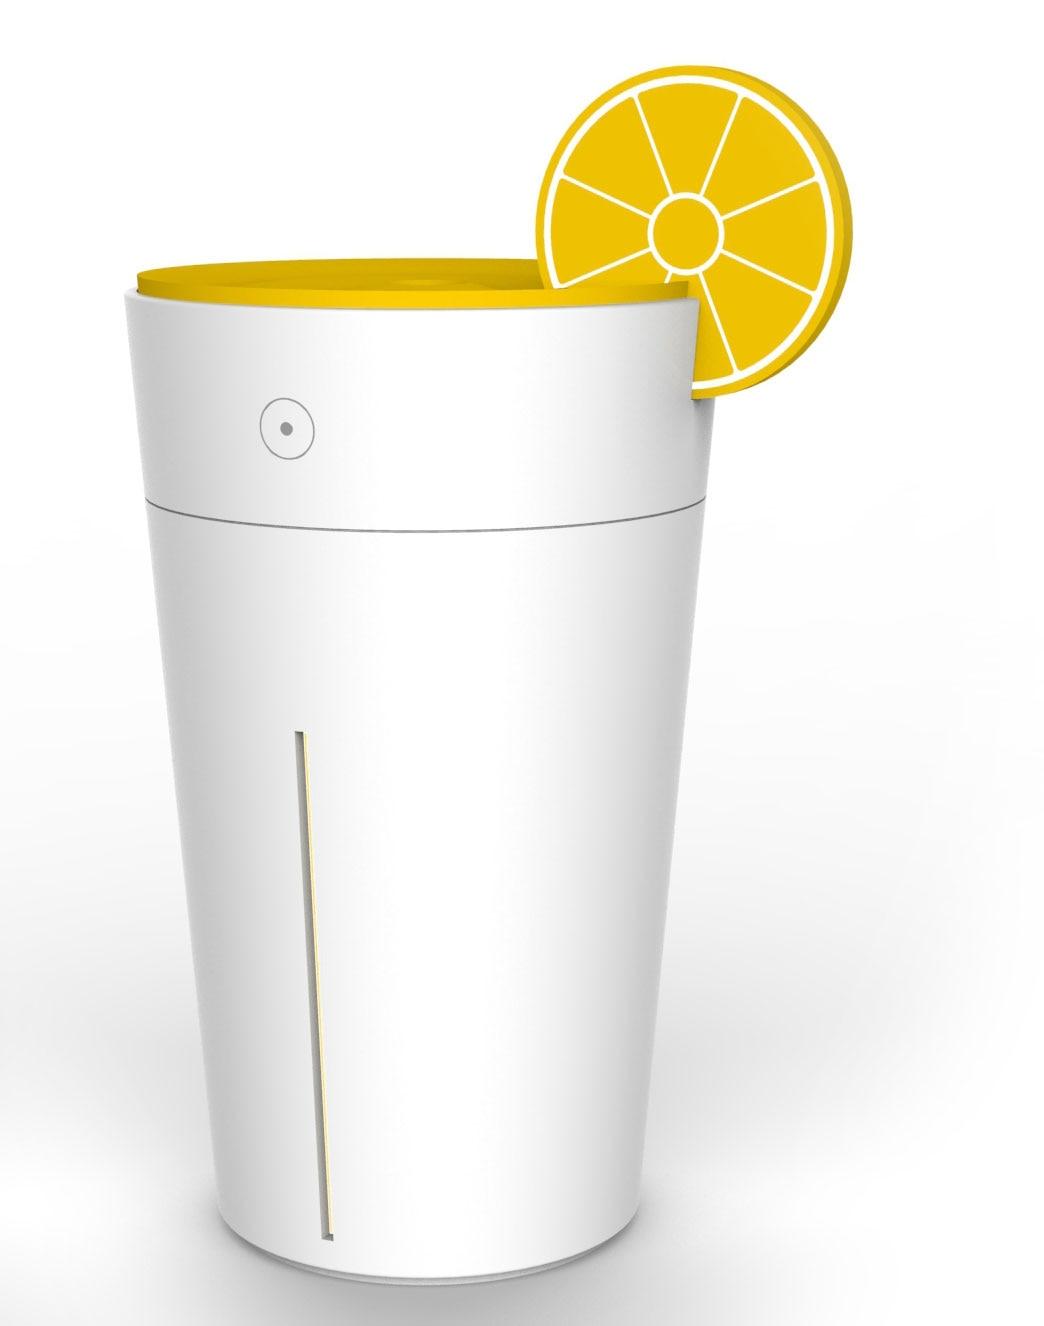 New Arrival Mini Lemon Ultrasonic Humidifier  Home Office USB Aroma Diffuser Creative Lemon Led Light Aromatherapy Mist Maker